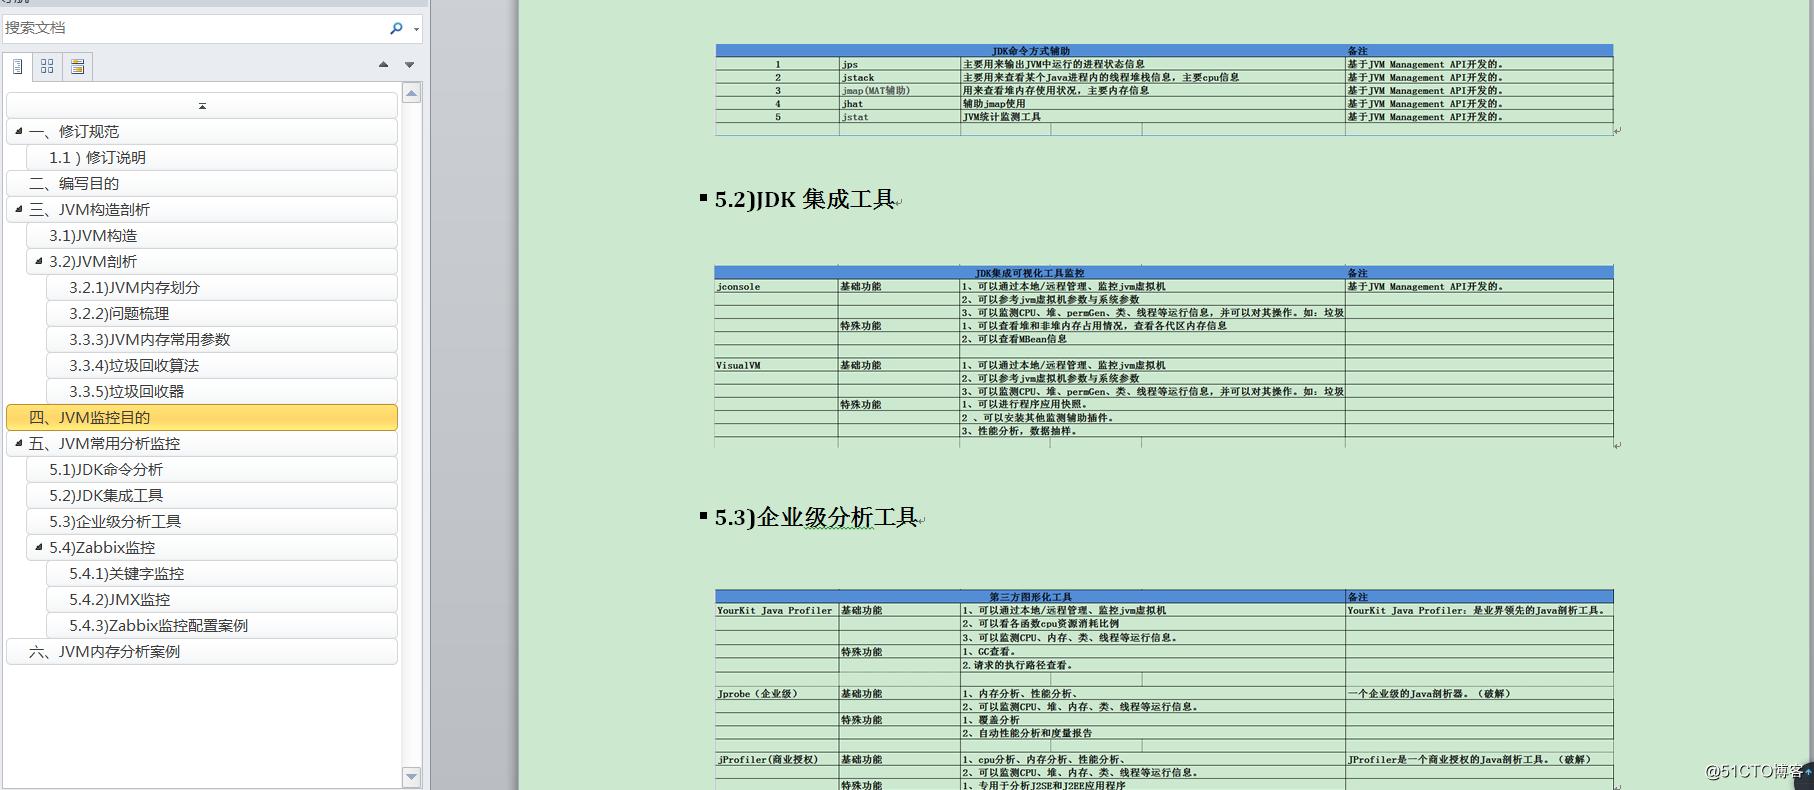 Analyzer tool(MAT)分析JVM内存泄露案例